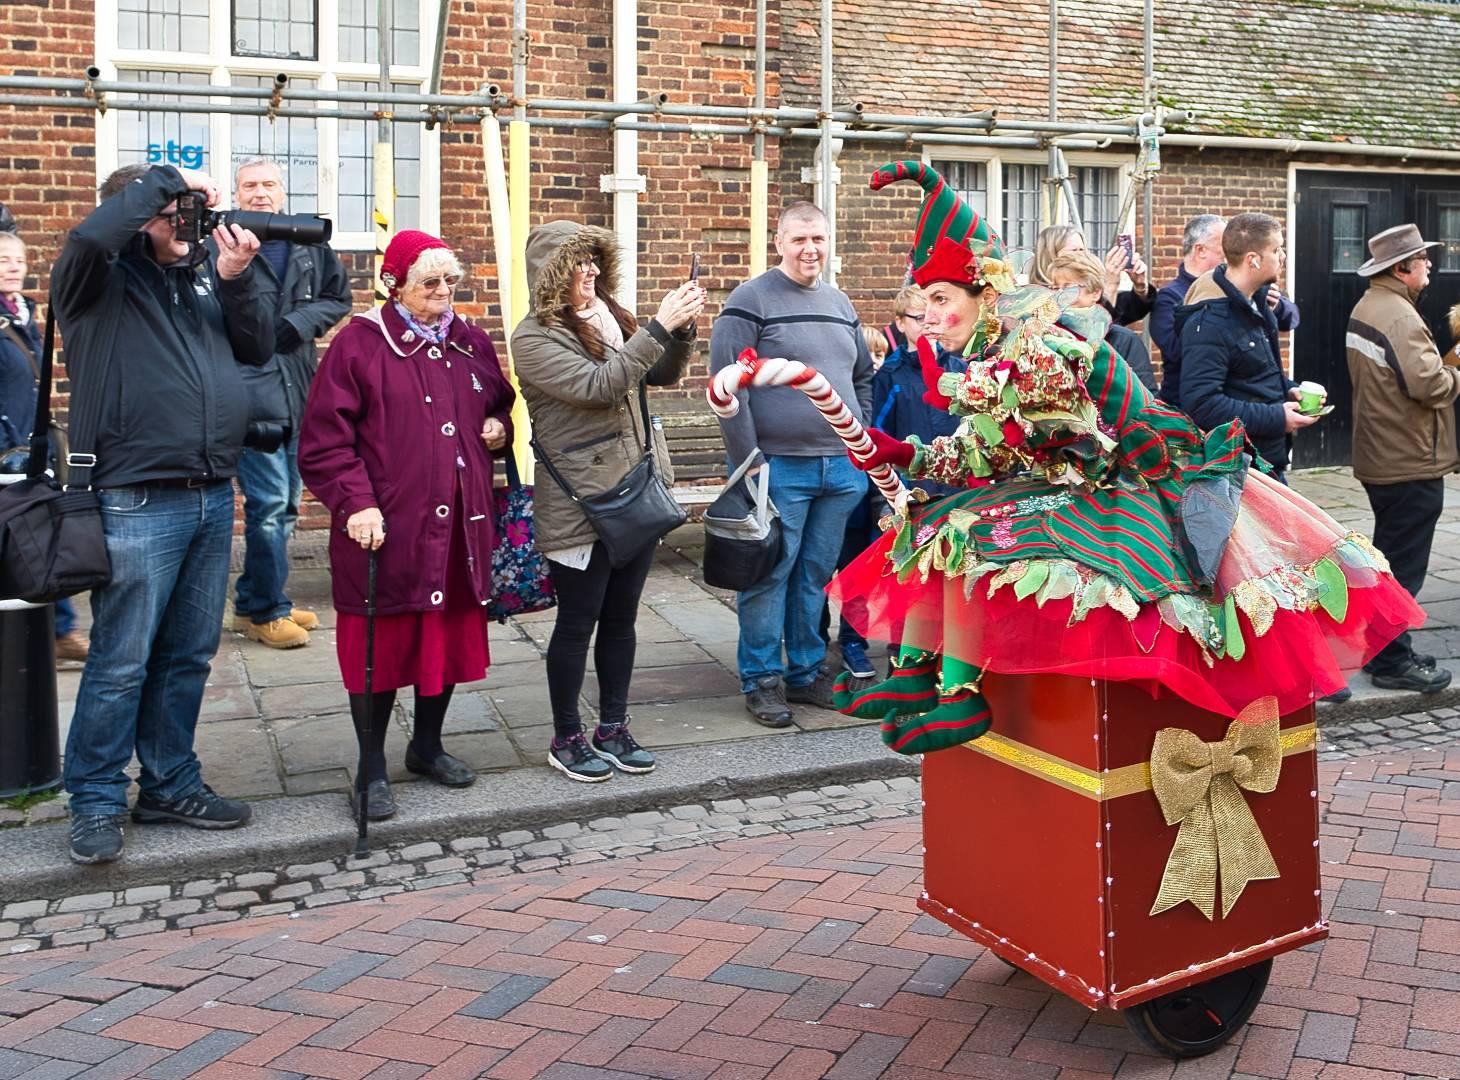 Santa's racing Elf – Christmas Dickens Elf racing on the high street, shot on Nikon Df and 24mm 1.8G